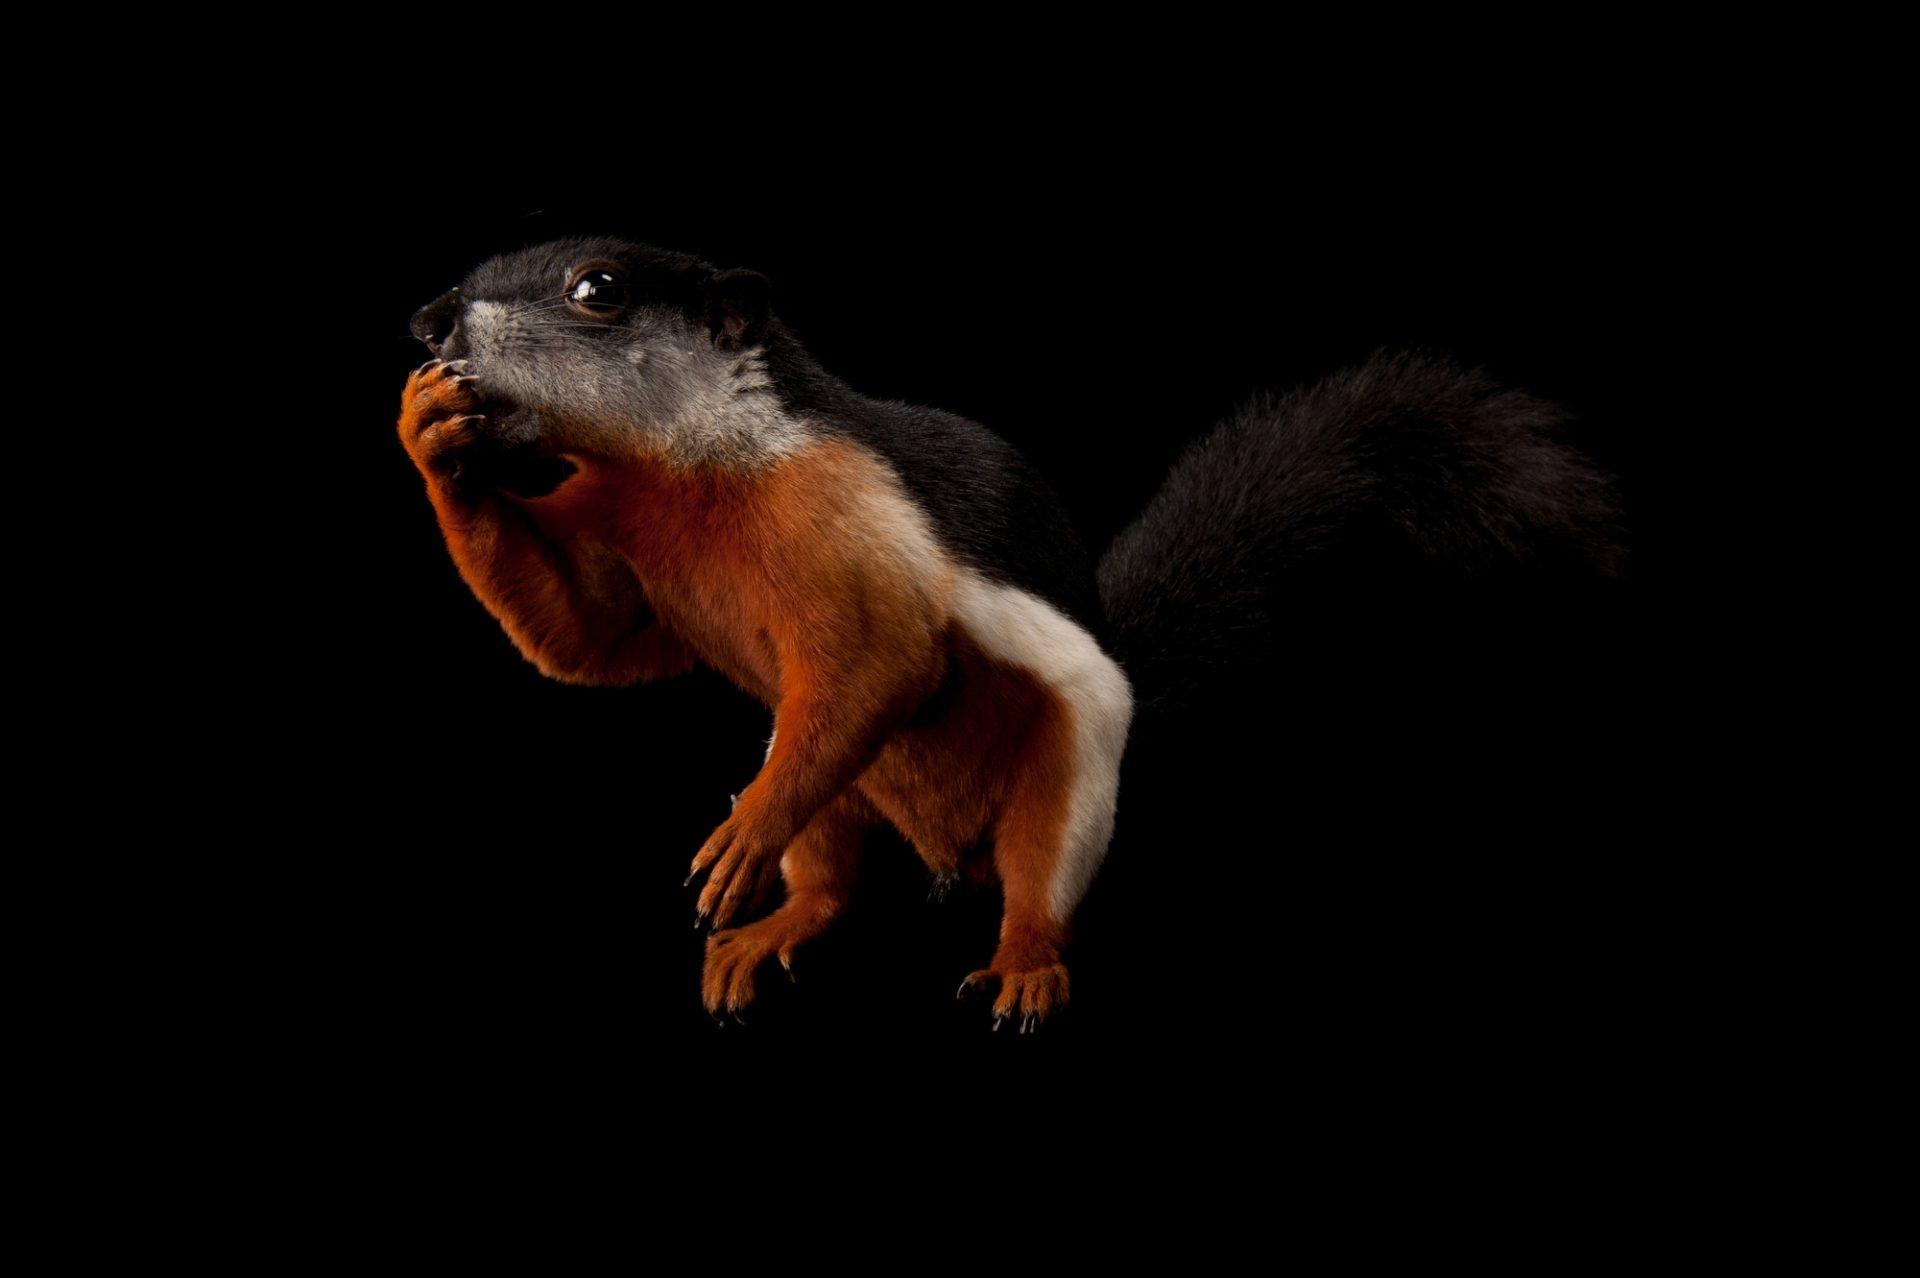 A Prevost's squirrel (Callosciurus prevostii prevostii) named 'Walnut' at the Houston Zoo.